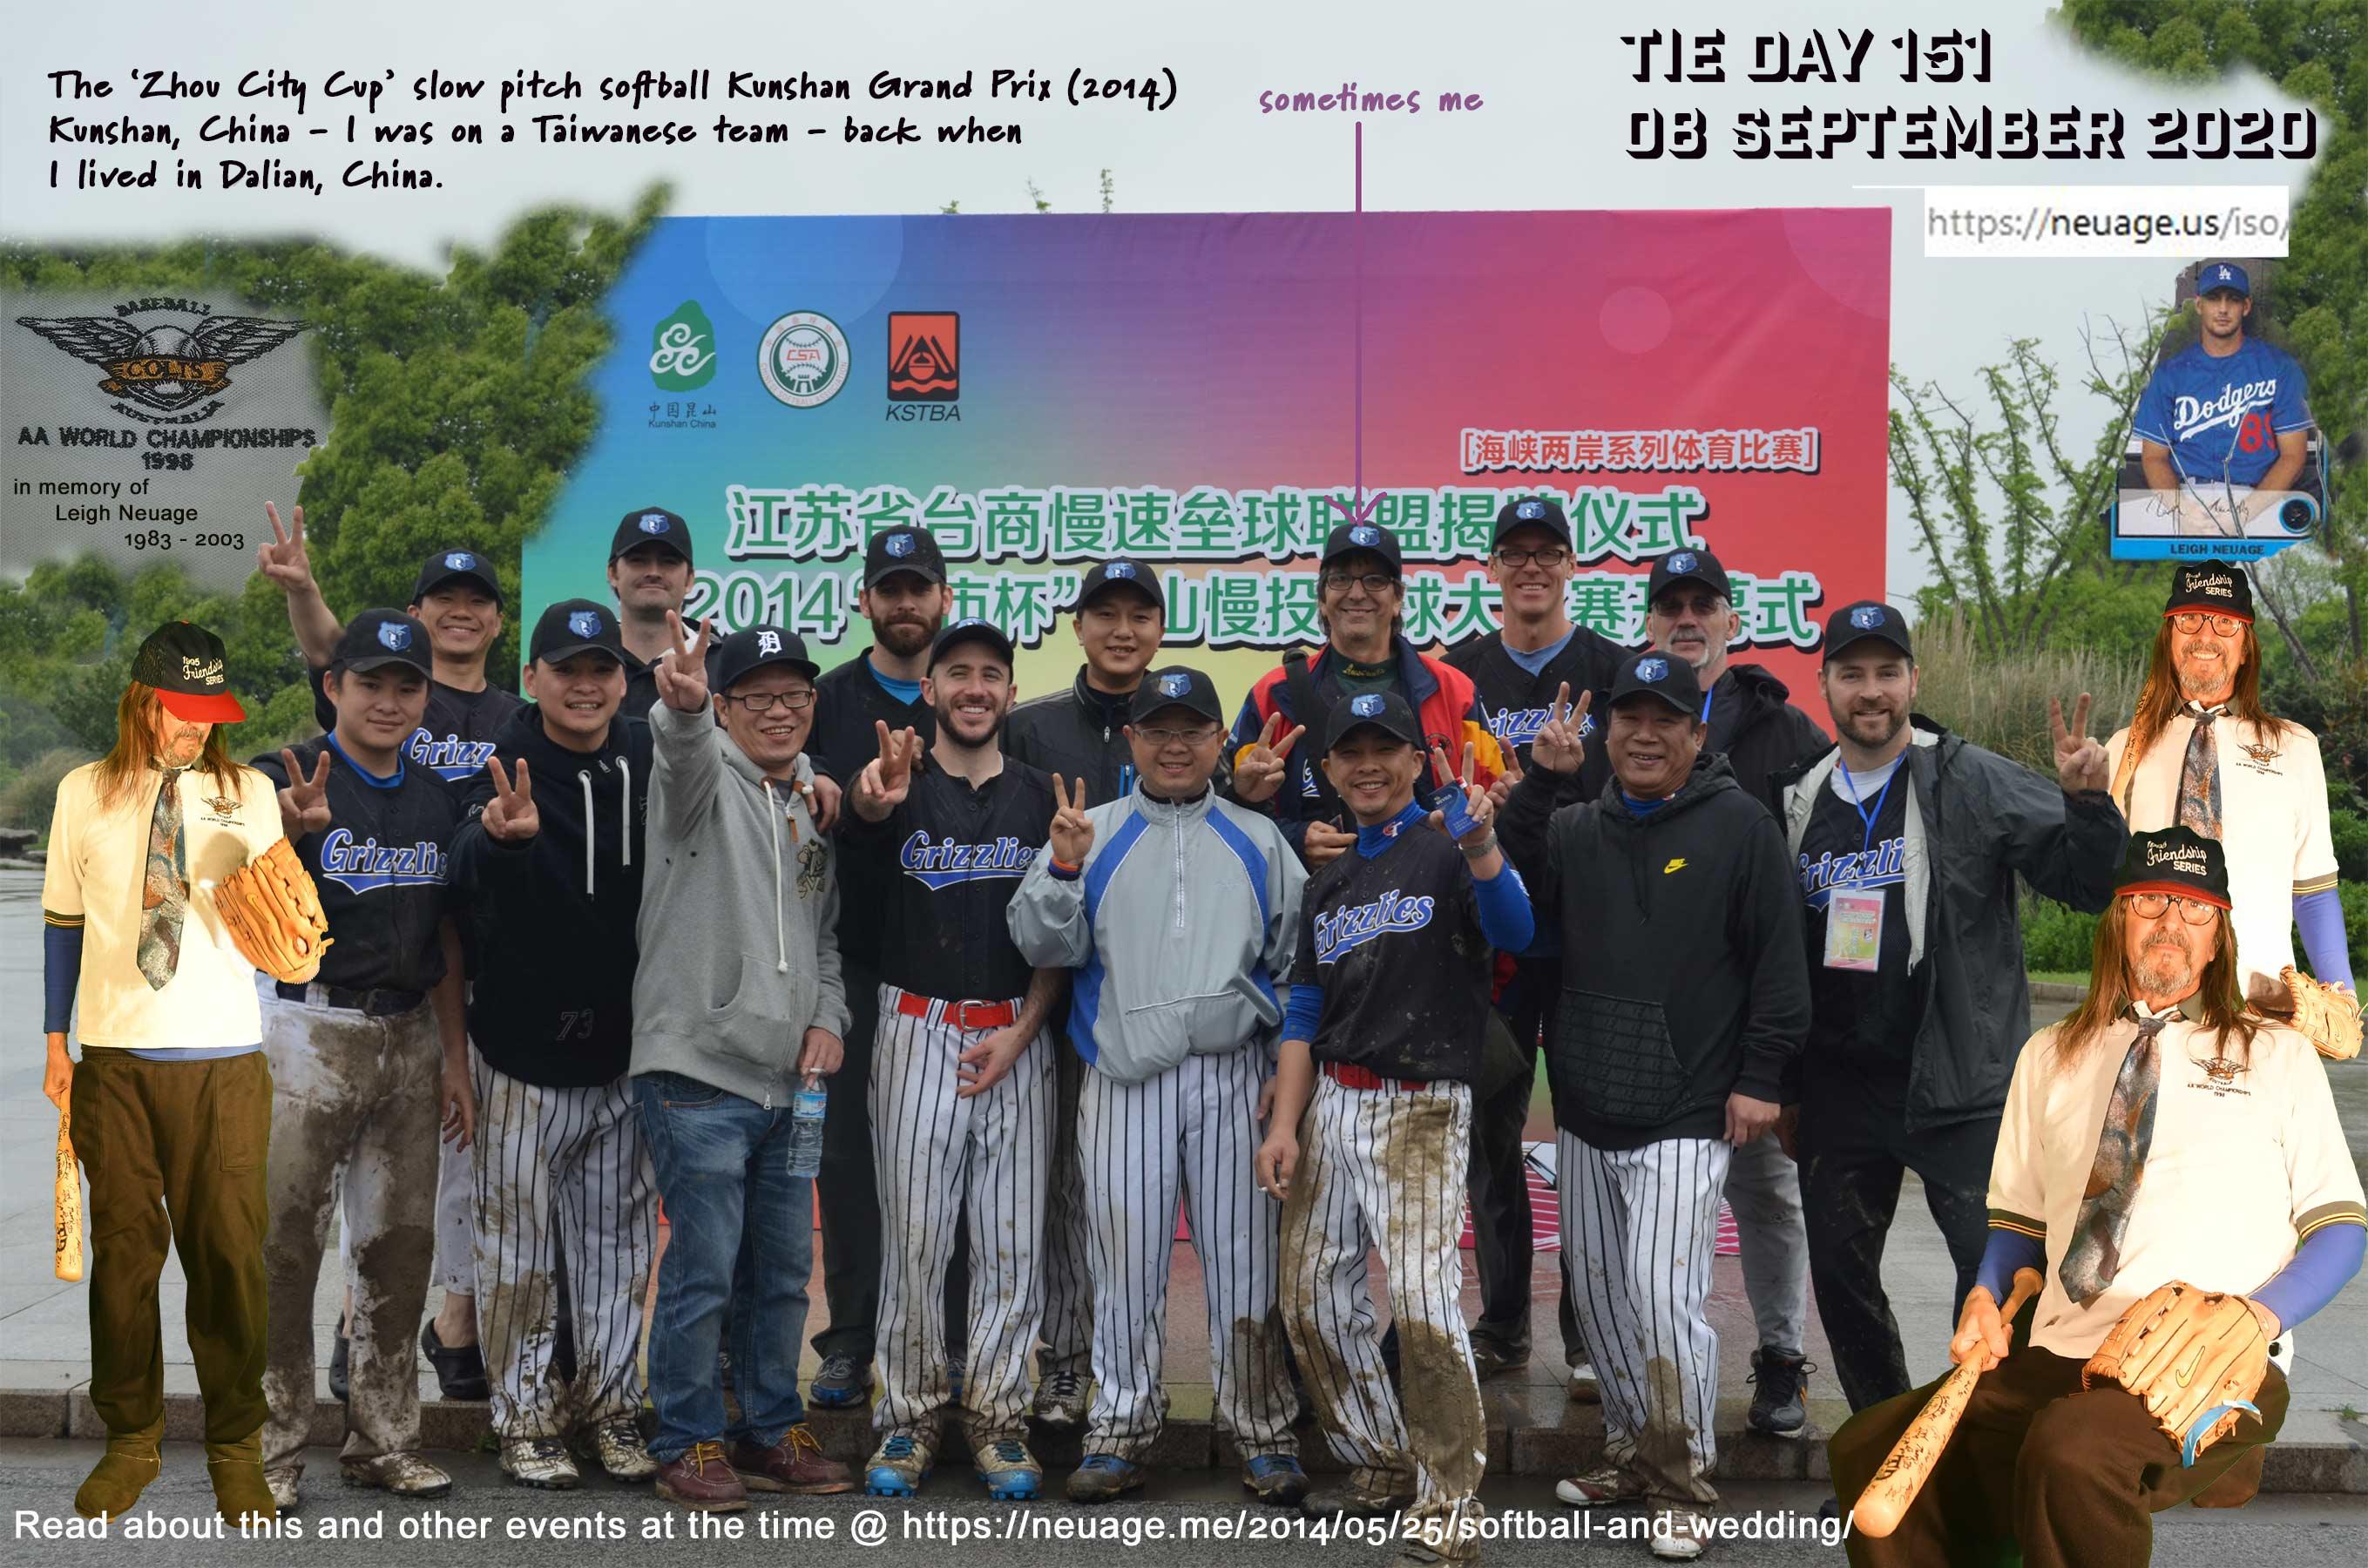 week 22 day #151 tie challenge of terrell neuage